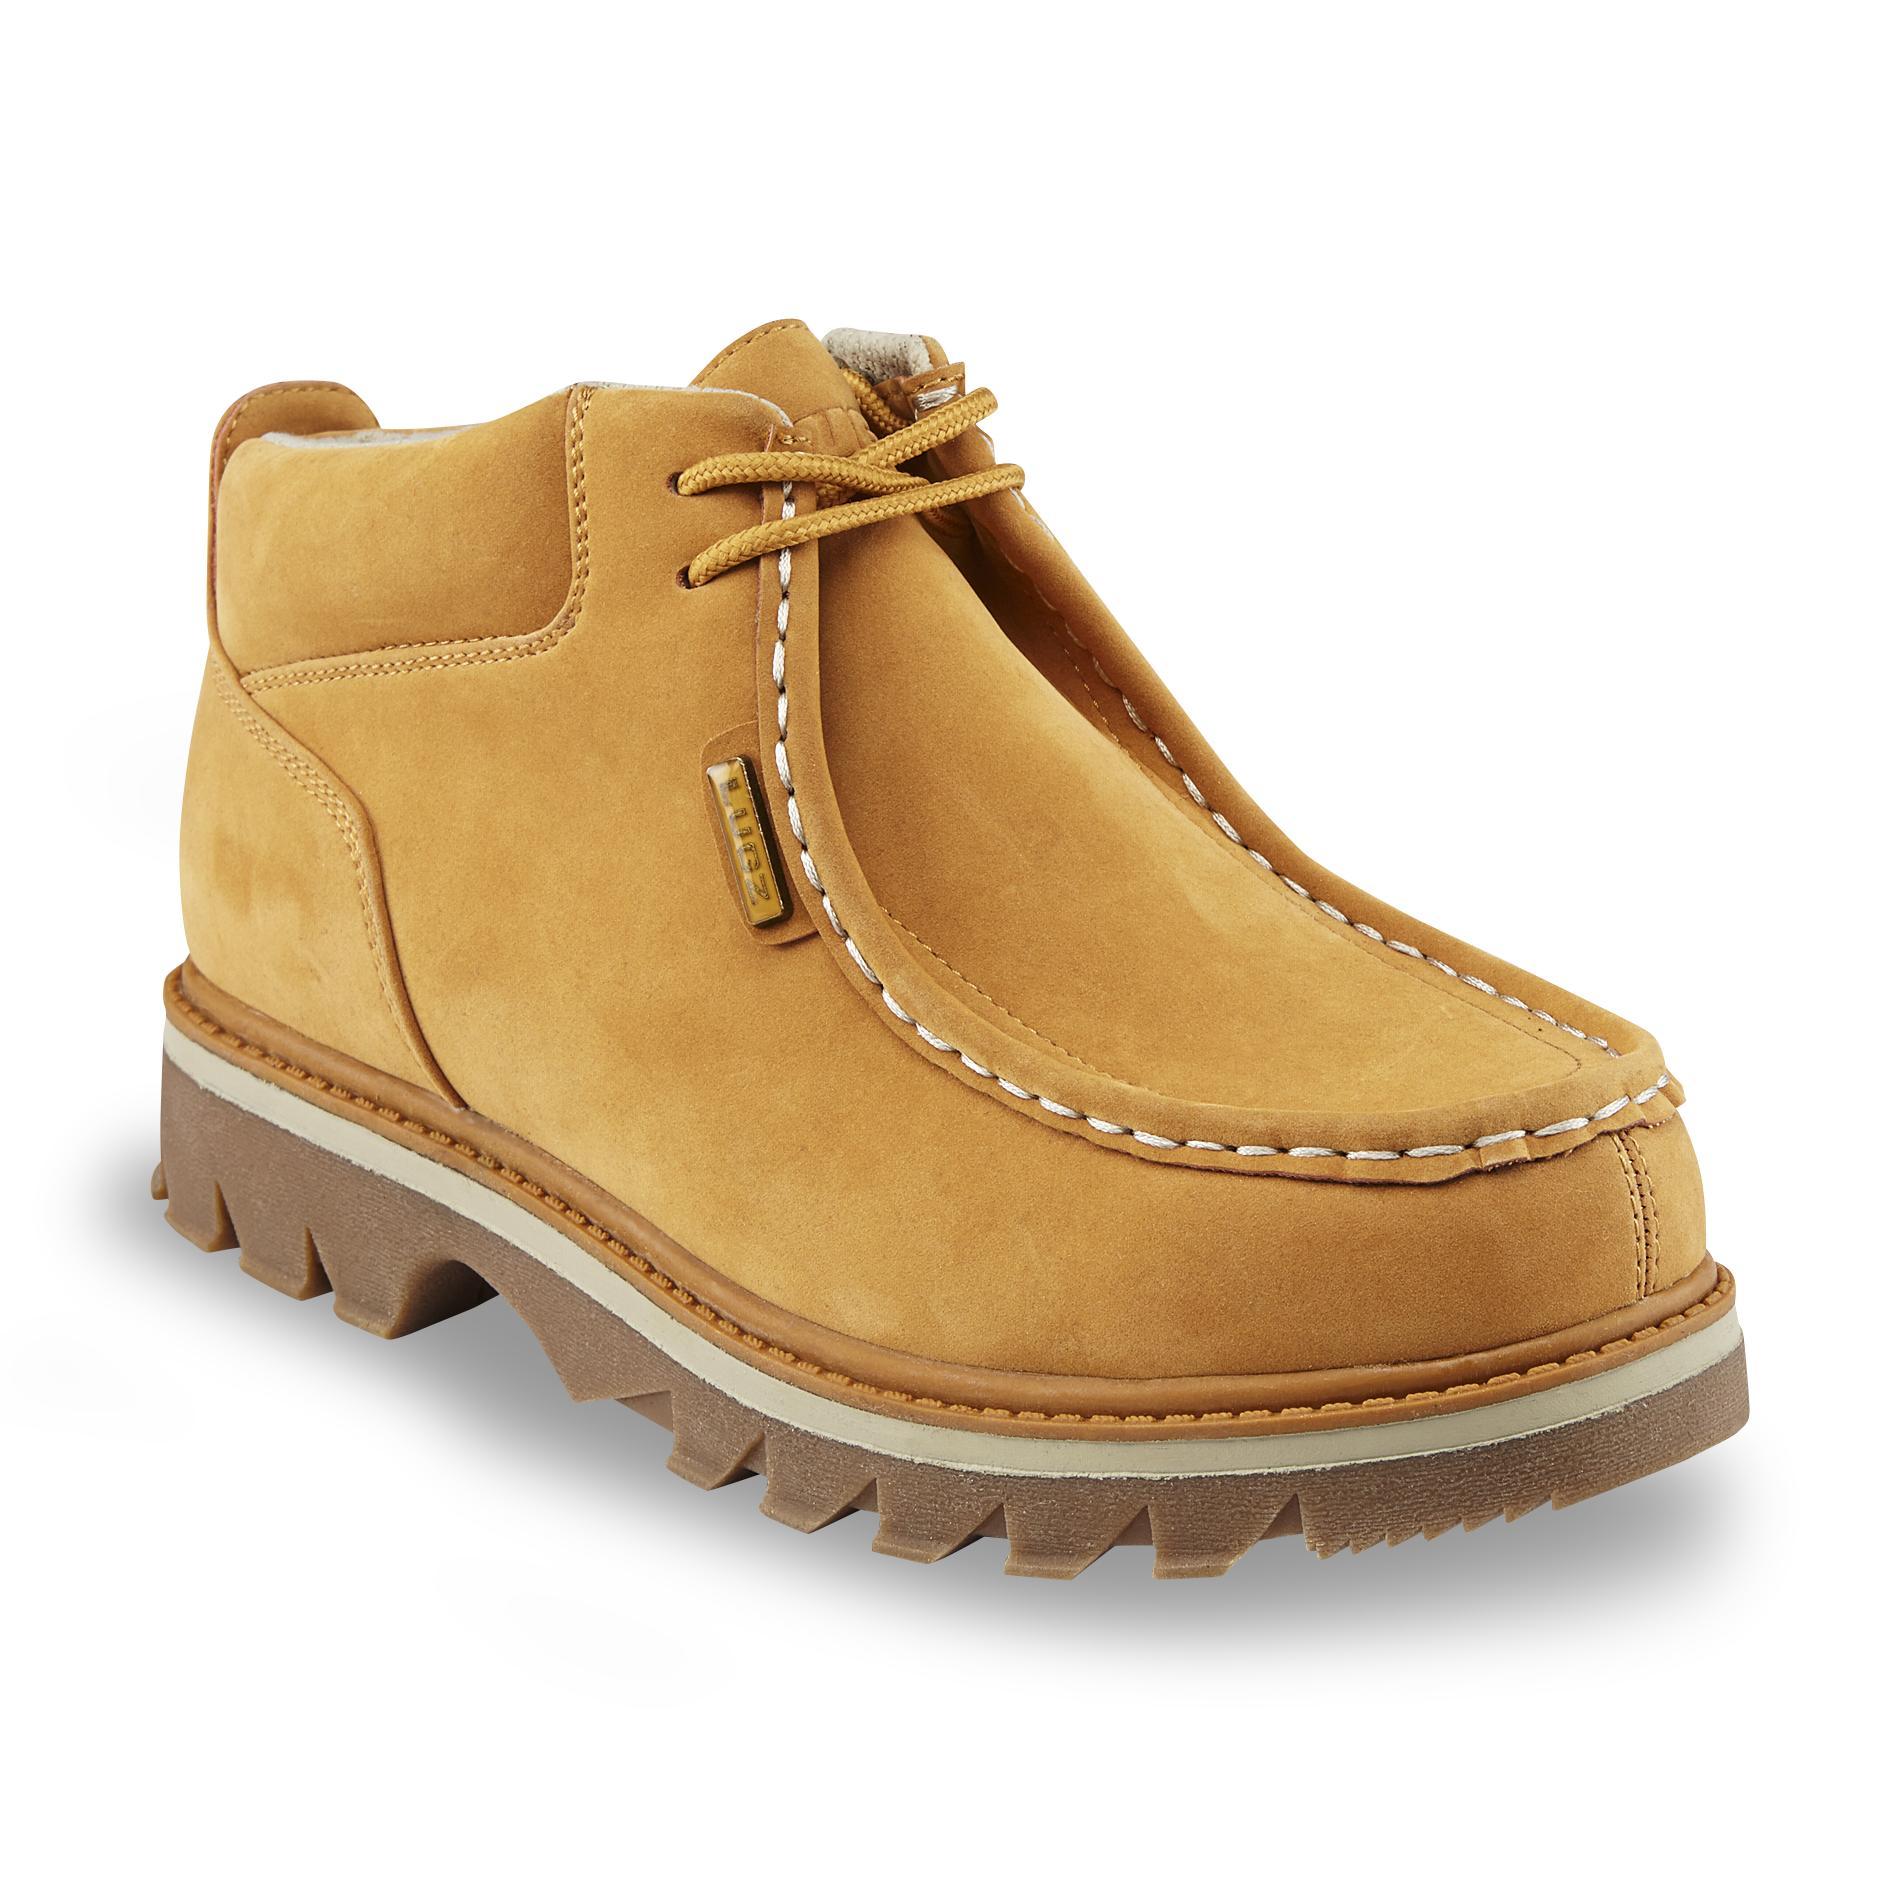 lugz boots lugz menu0027s fringe wheat moccasin boot - shoes - menu0027s shoes - menu0027s boots FHVKVFC